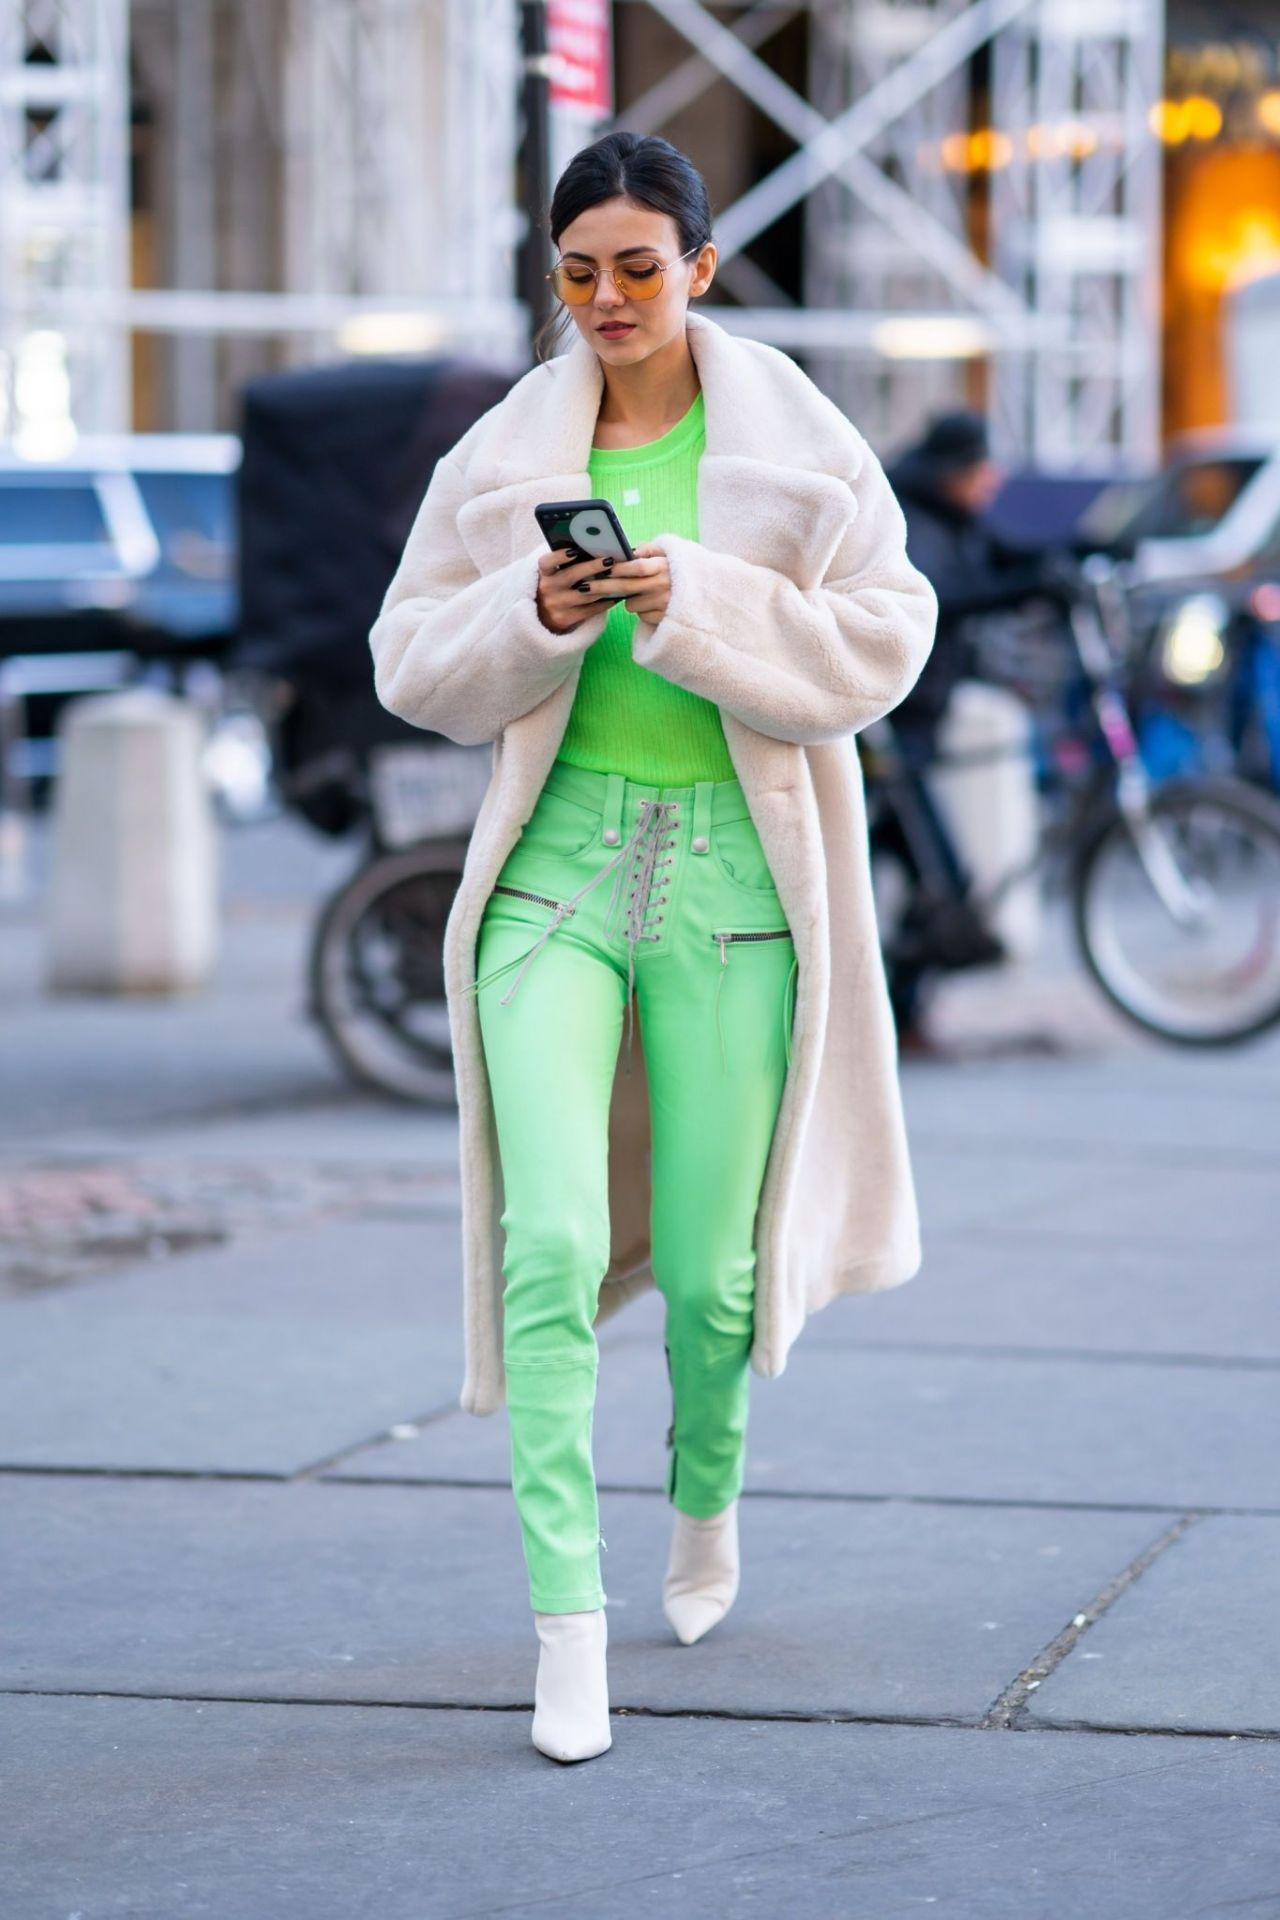 Victoria Justice Street Fashion 02 09 2019